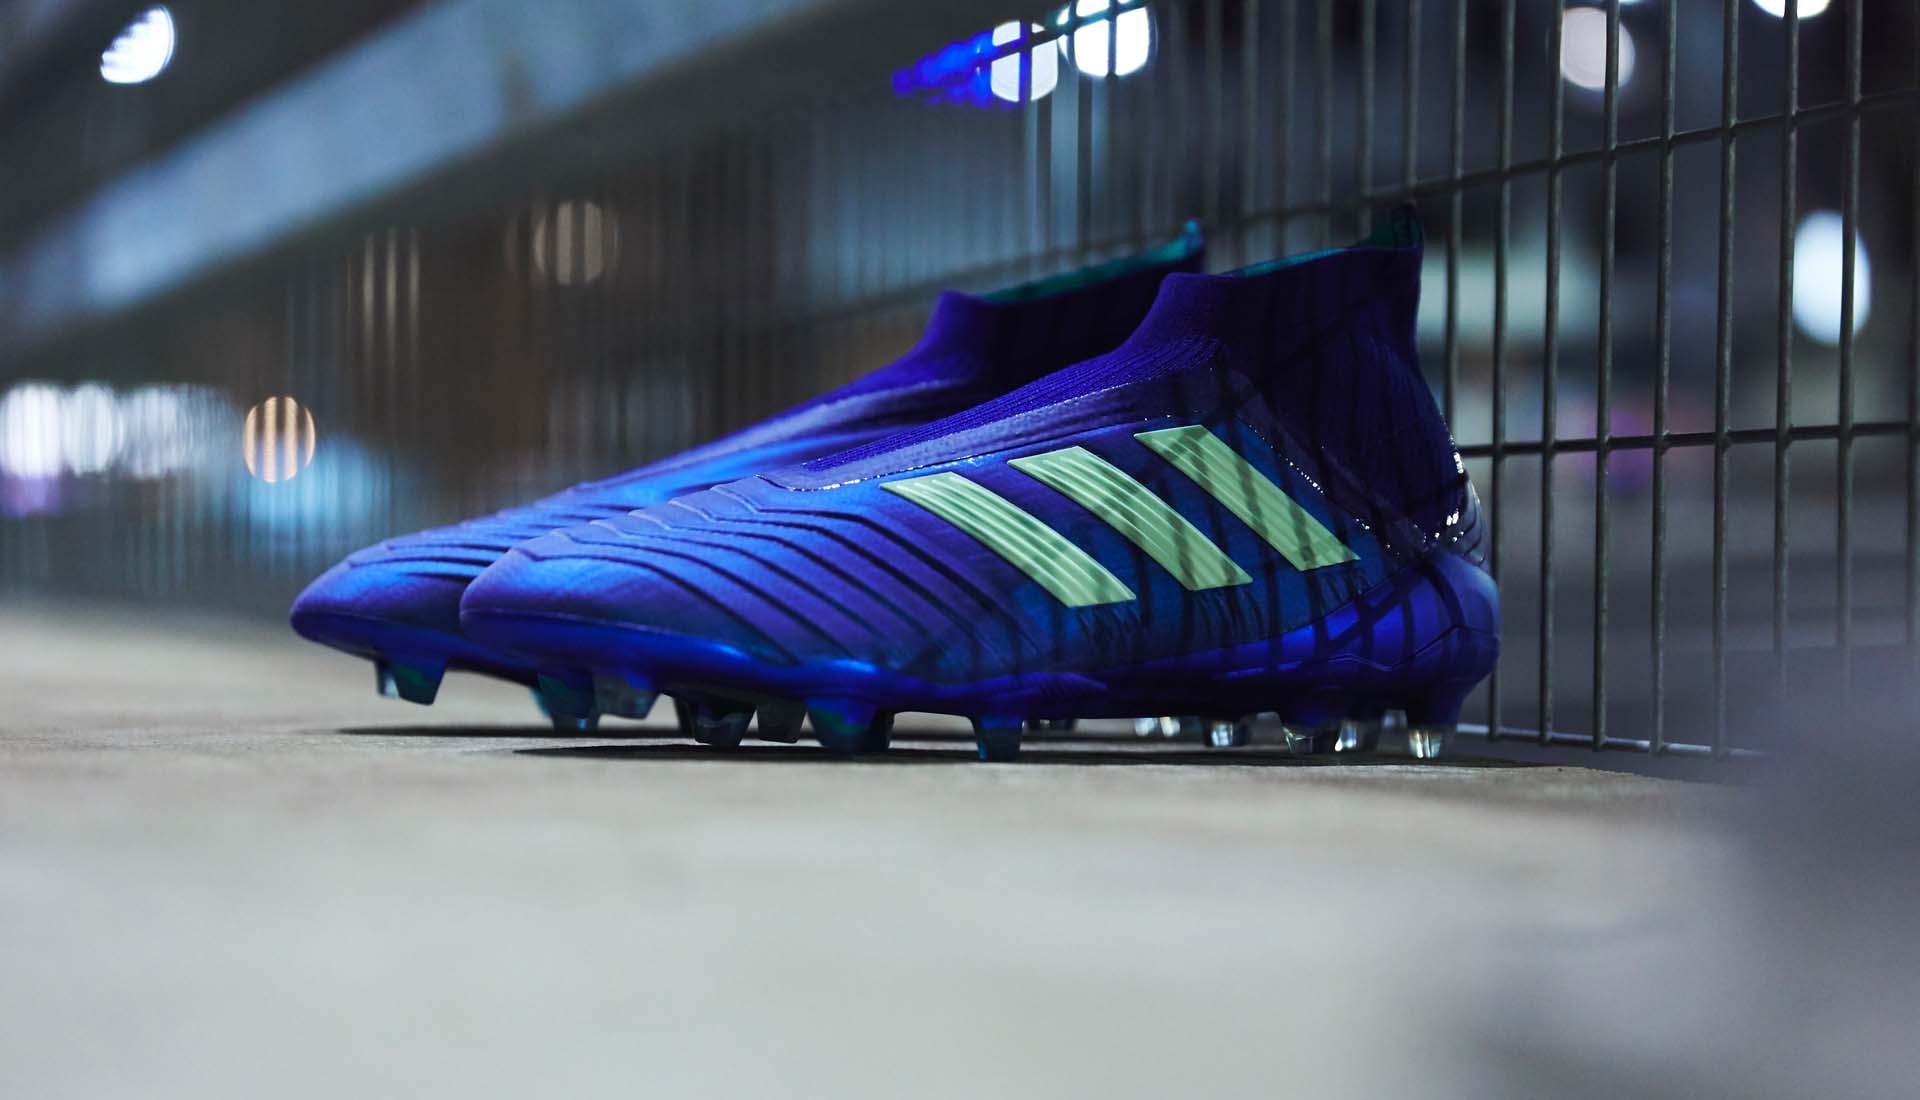 La chaussure de foot adidasPredator18+